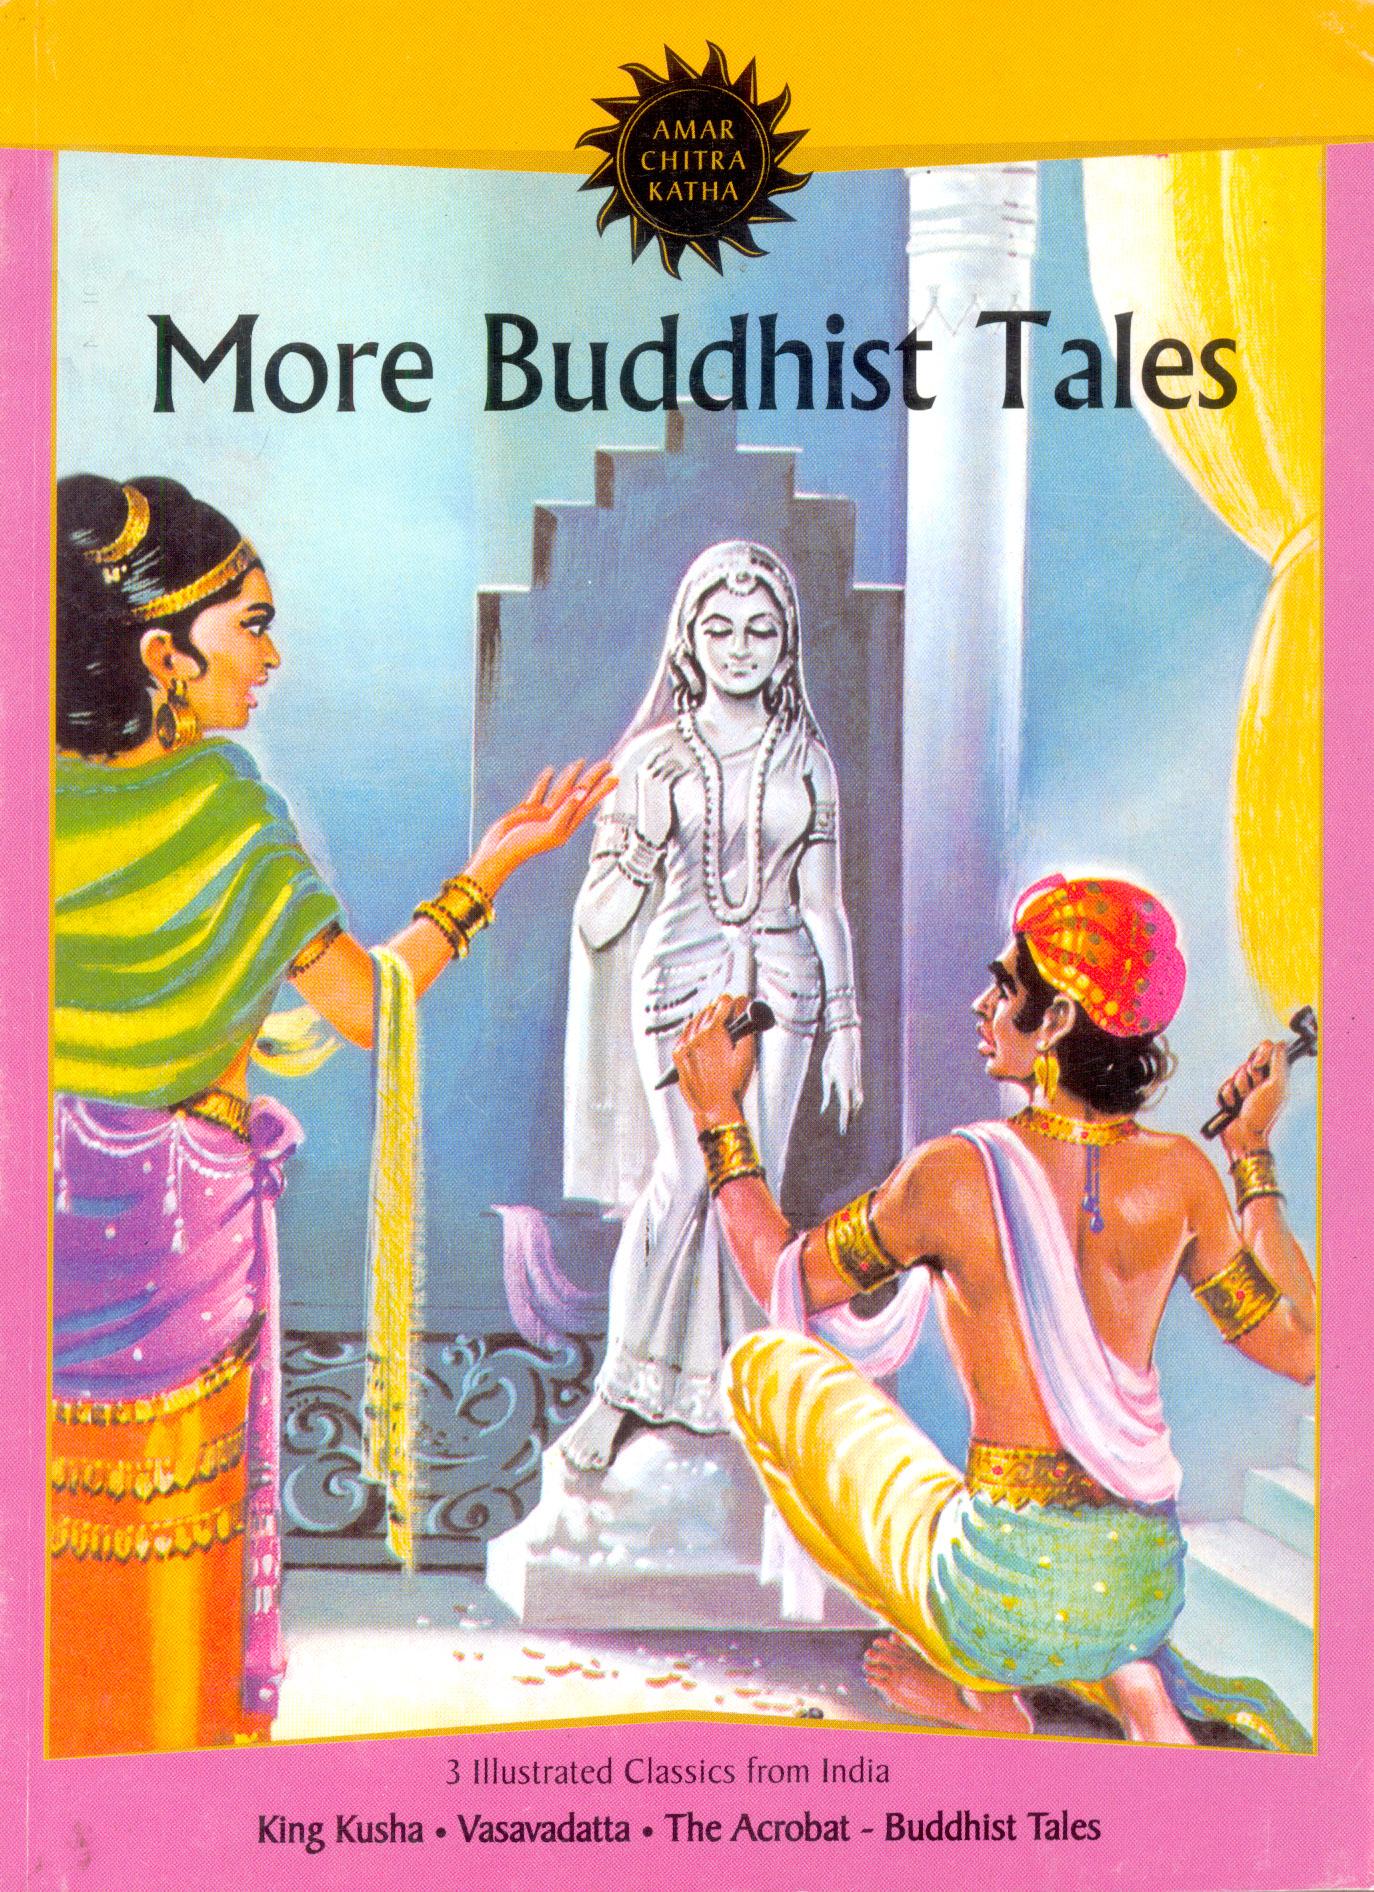 Amar Chitra Katha - More Buddhist Tales - 10023